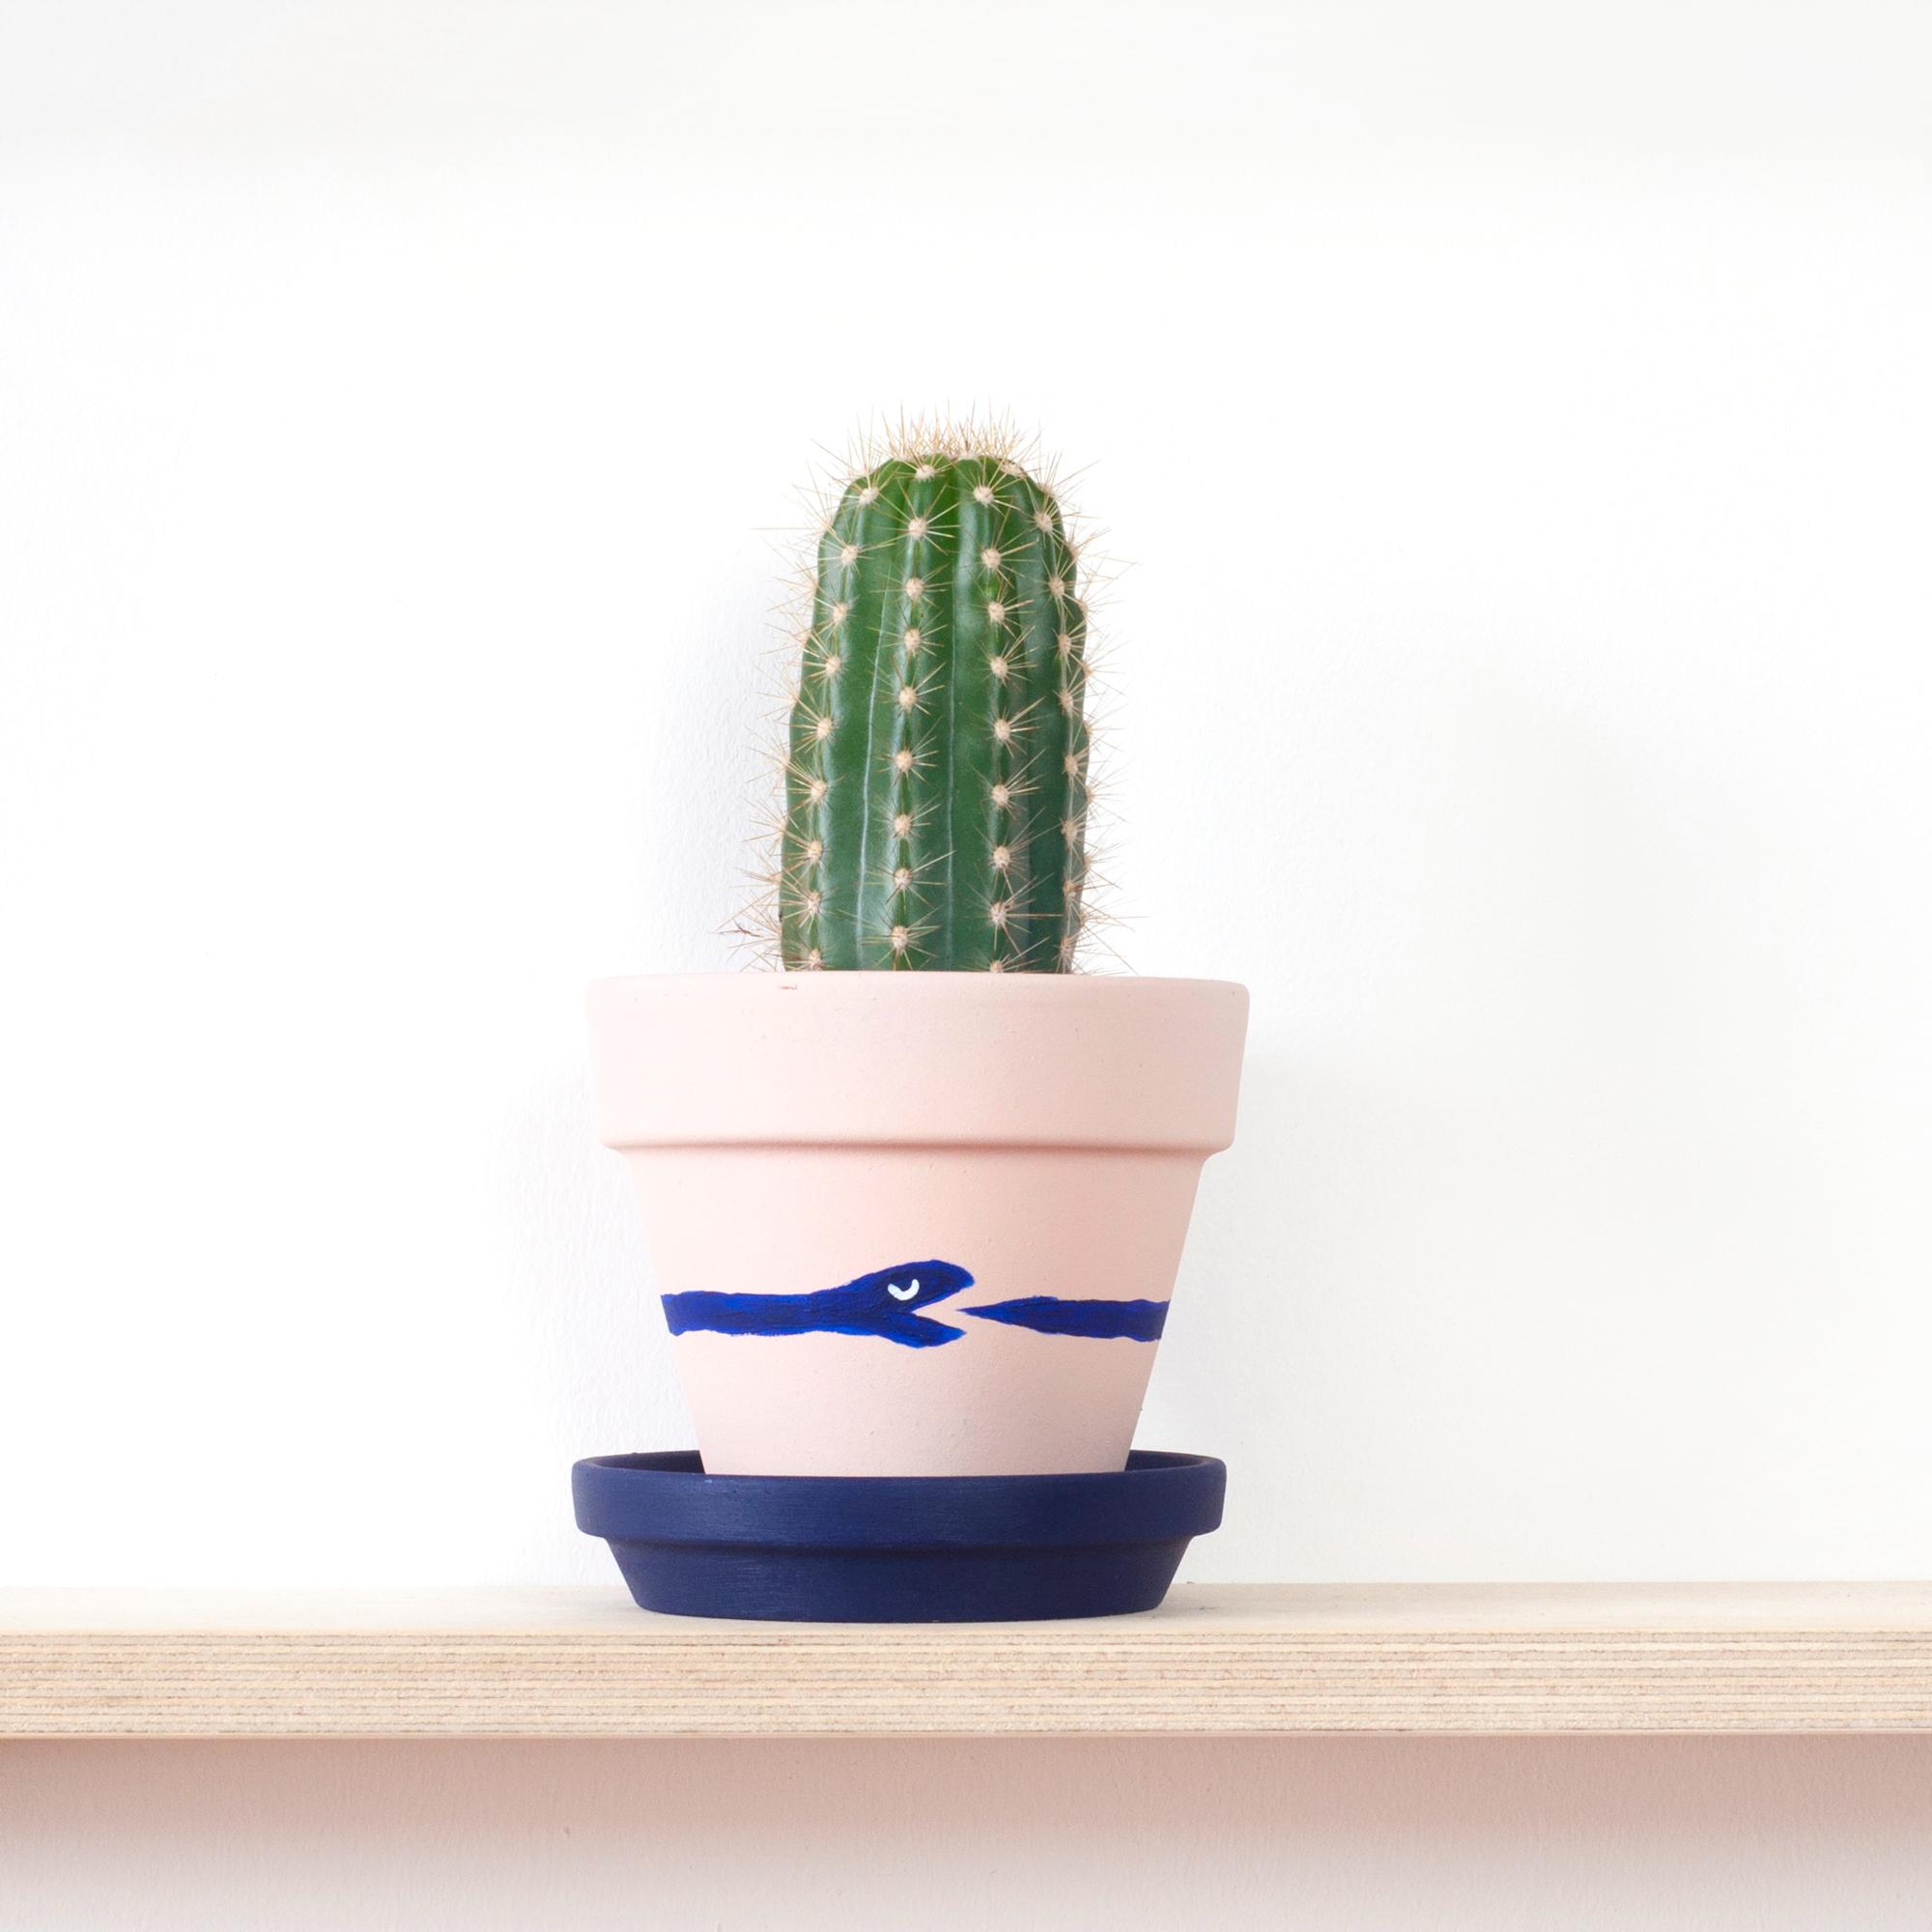 3-plantpot-manolyaisik-web.jpg